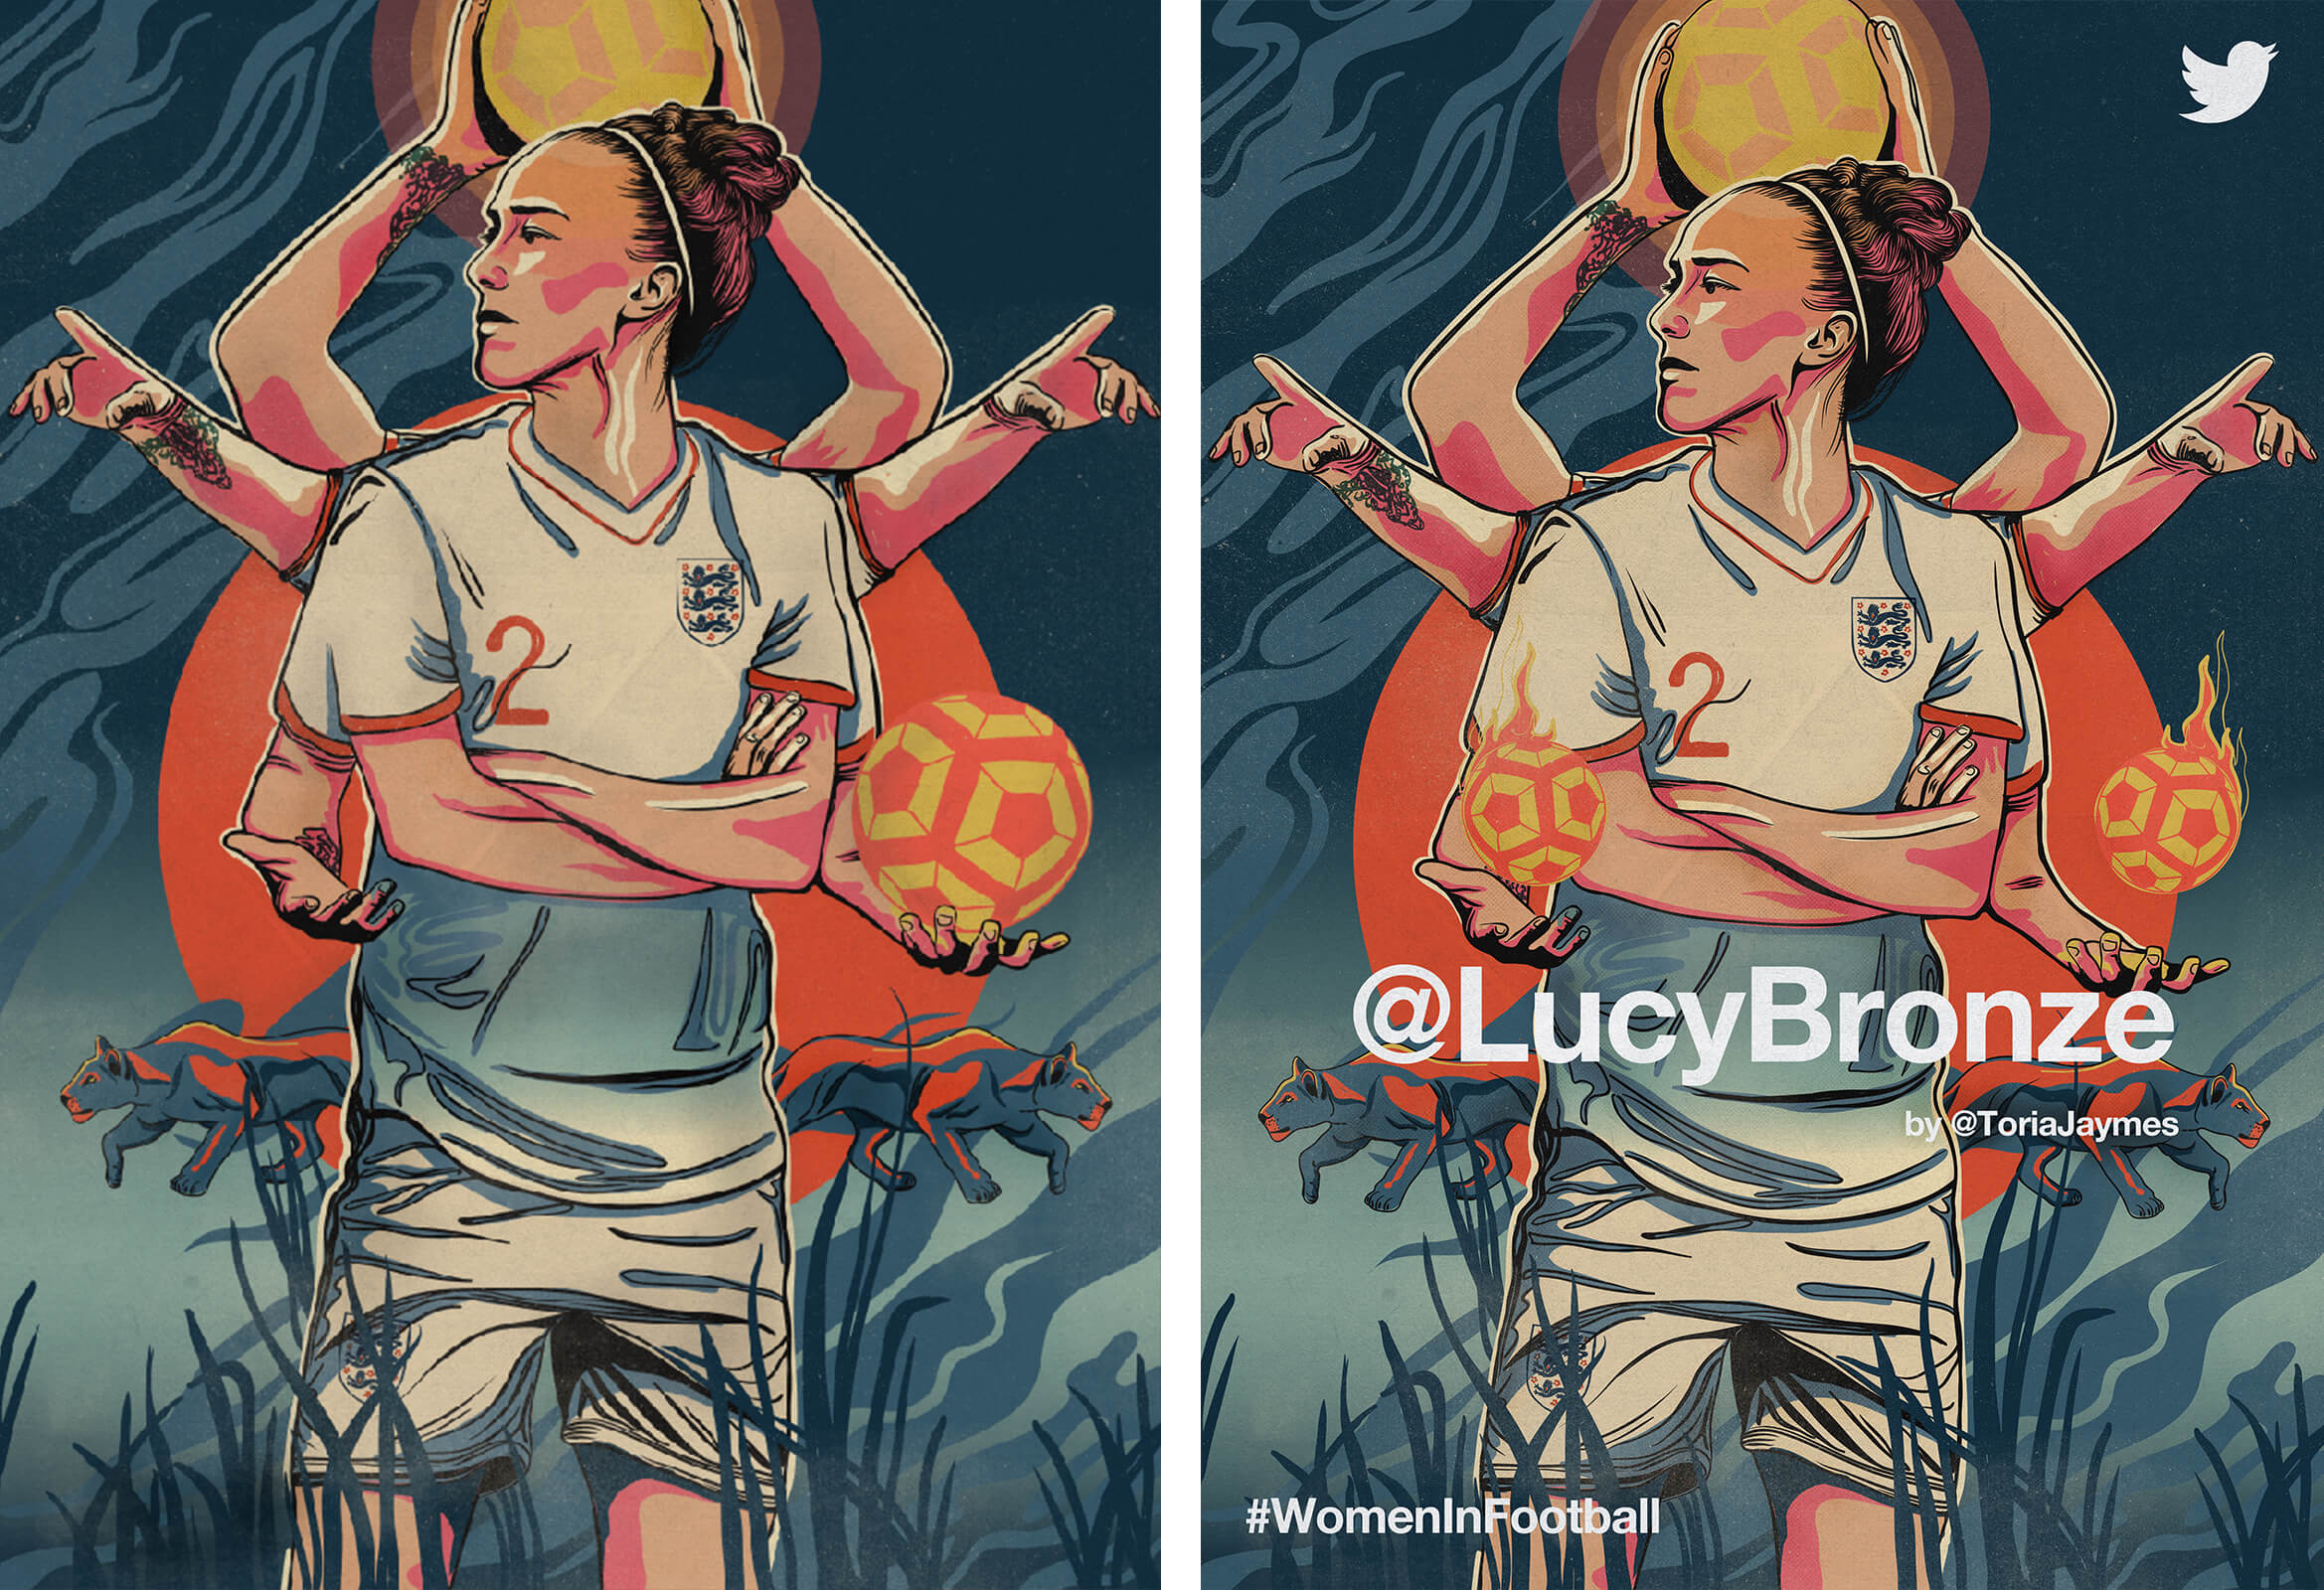 LucyBronzw